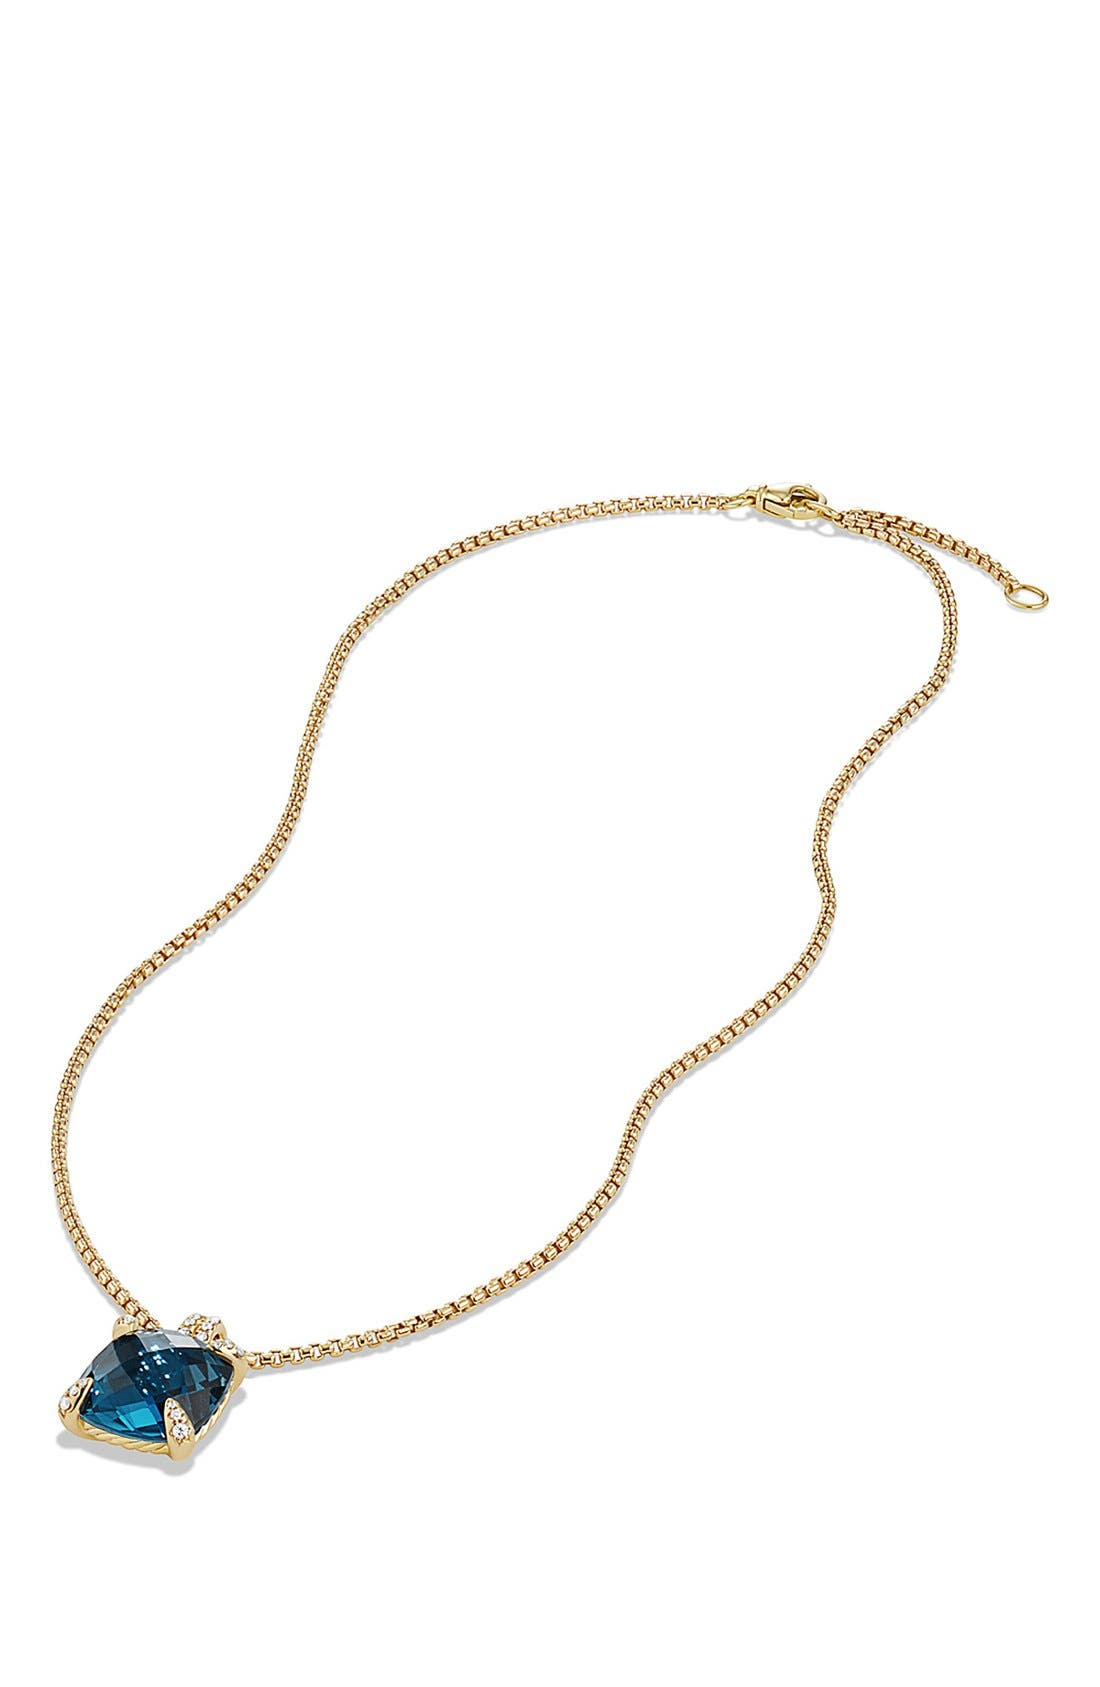 'Châtelaine' Pendant Necklace with Diamonds in 18K Gold,                             Alternate thumbnail 3, color,                             HAMPTON BLUE TOPAZ